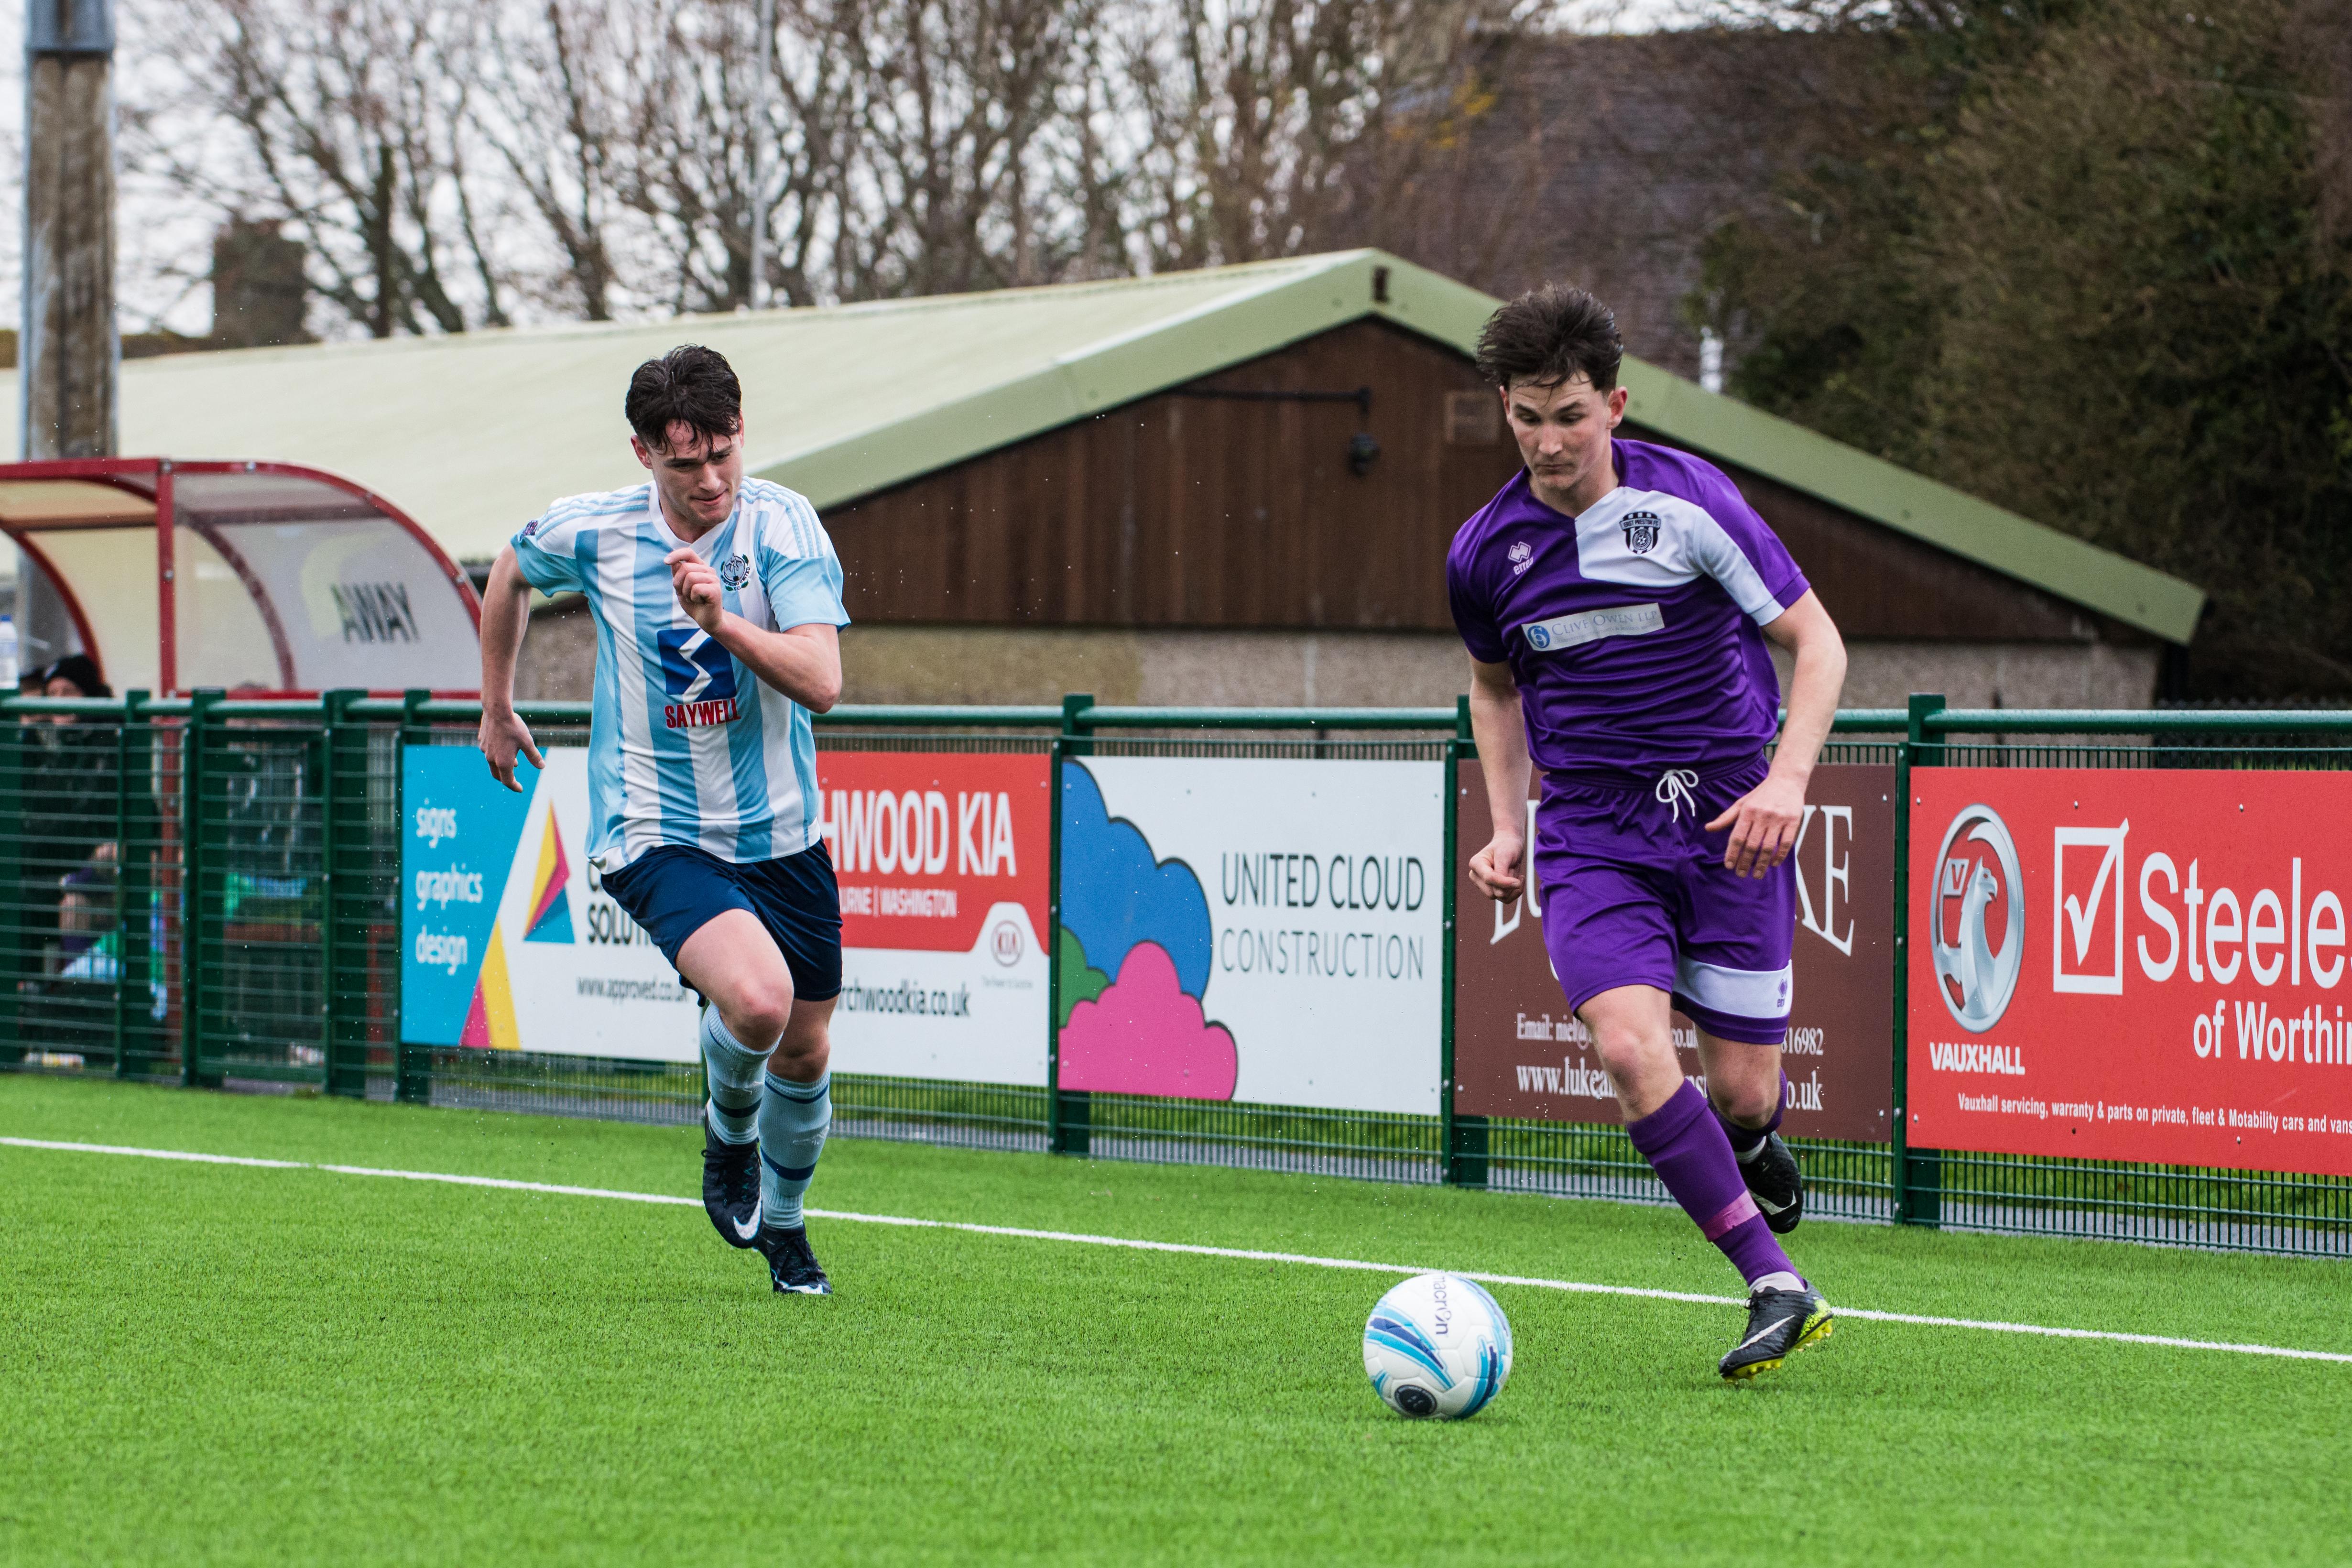 DAVID_JEFFERY Worthing United FC vs East Preston FC 02.04.18 63